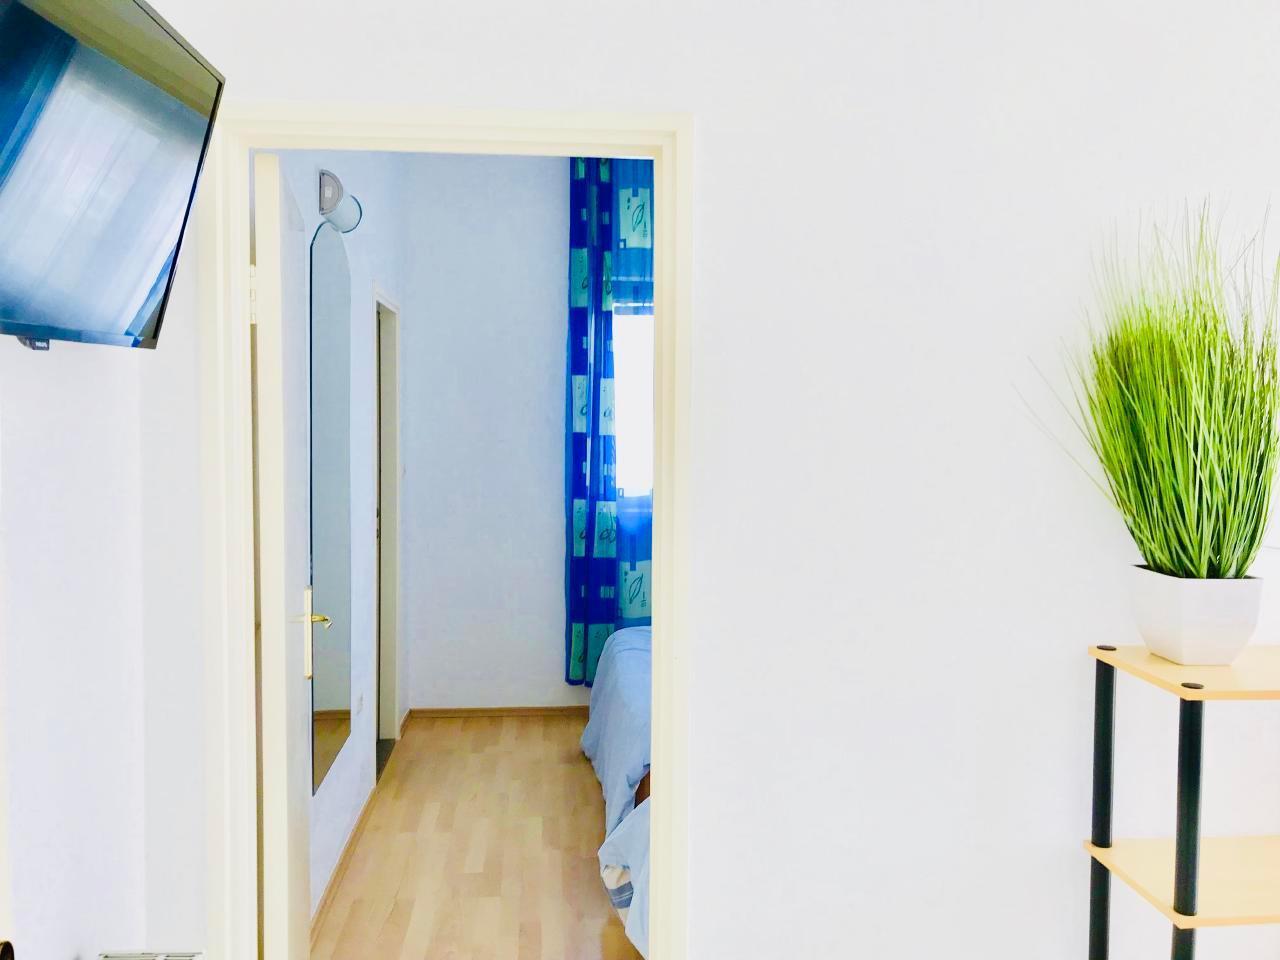 Ferienwohnung Apartmenthaus Ruza 7 - Studio (98388), Kaštel Štafilić, , Dalmatien, Kroatien, Bild 5